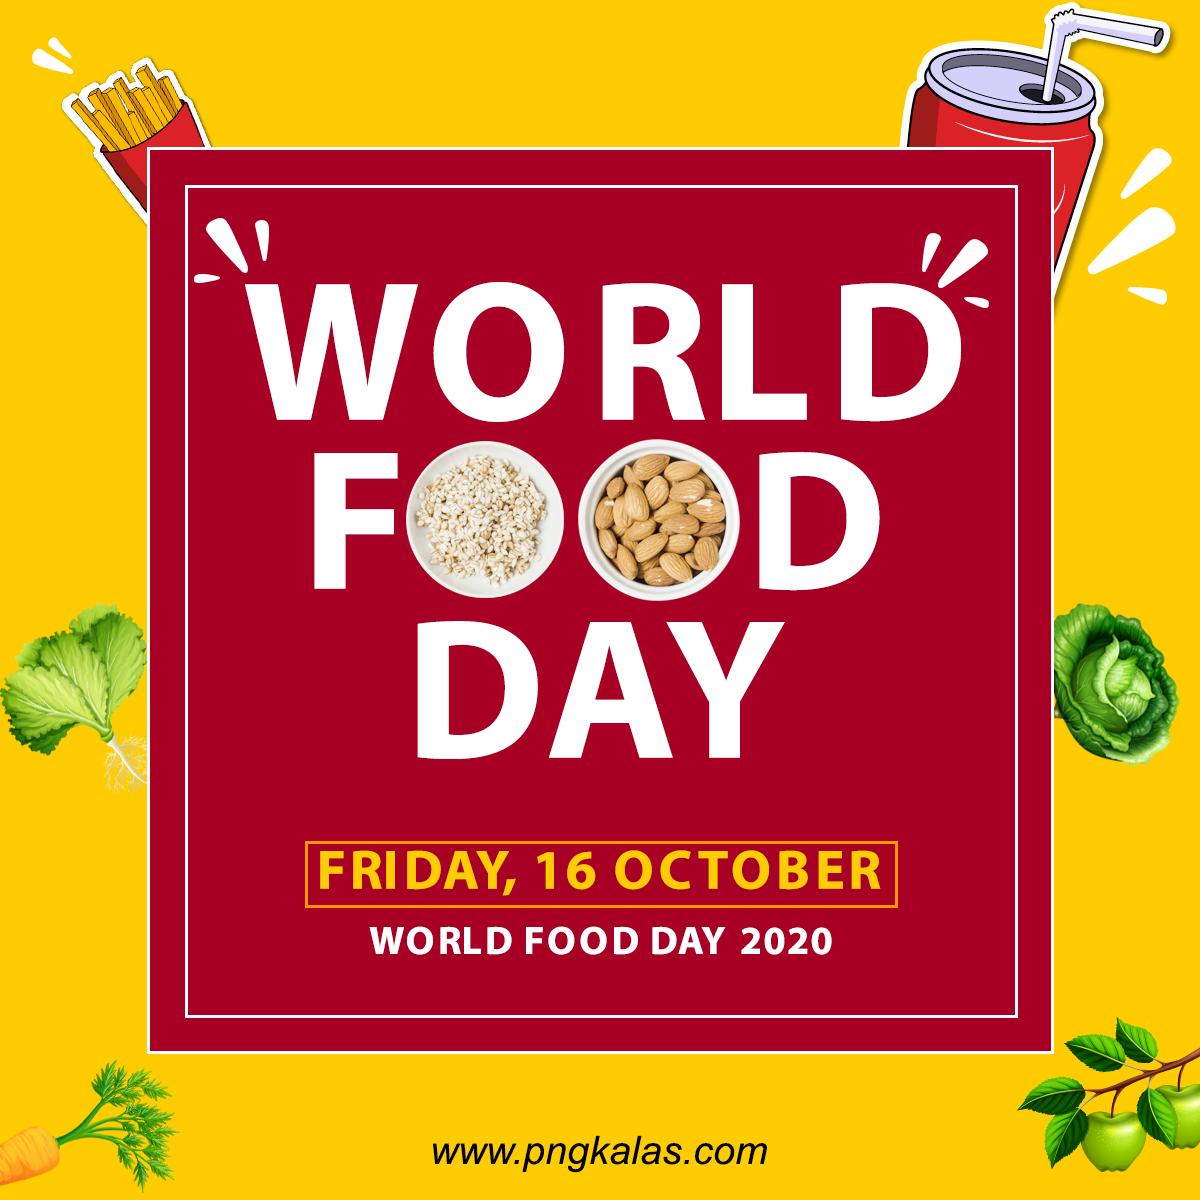 World Food Day Poster Design